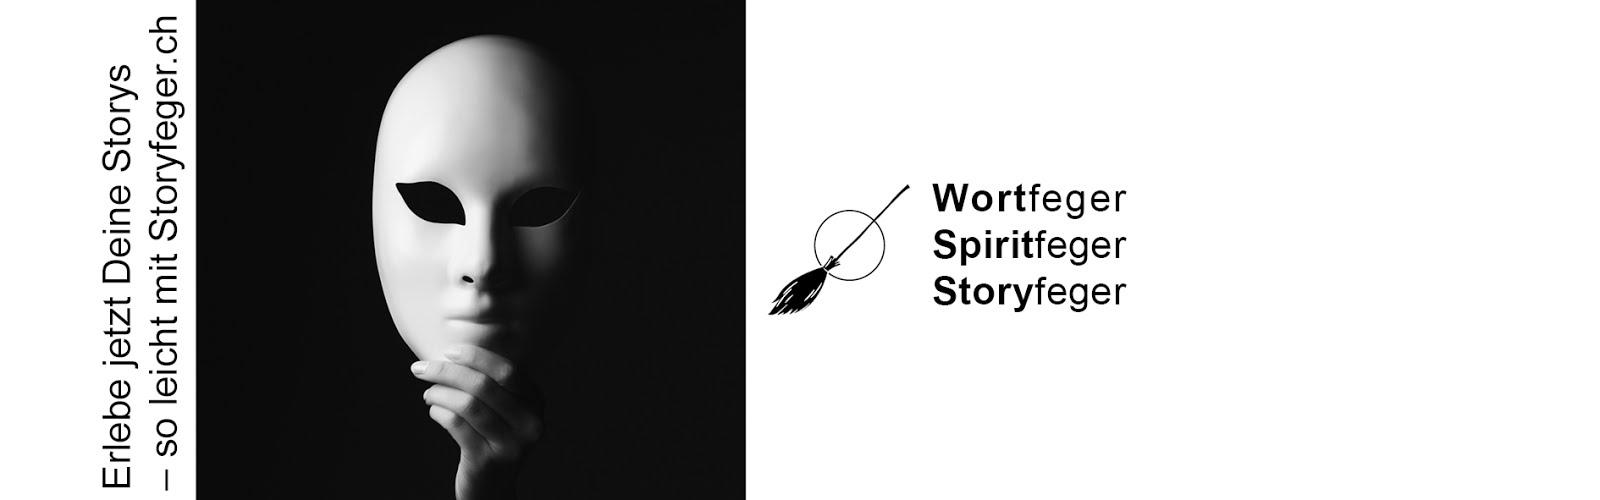 Wortfeger - Storyfeger